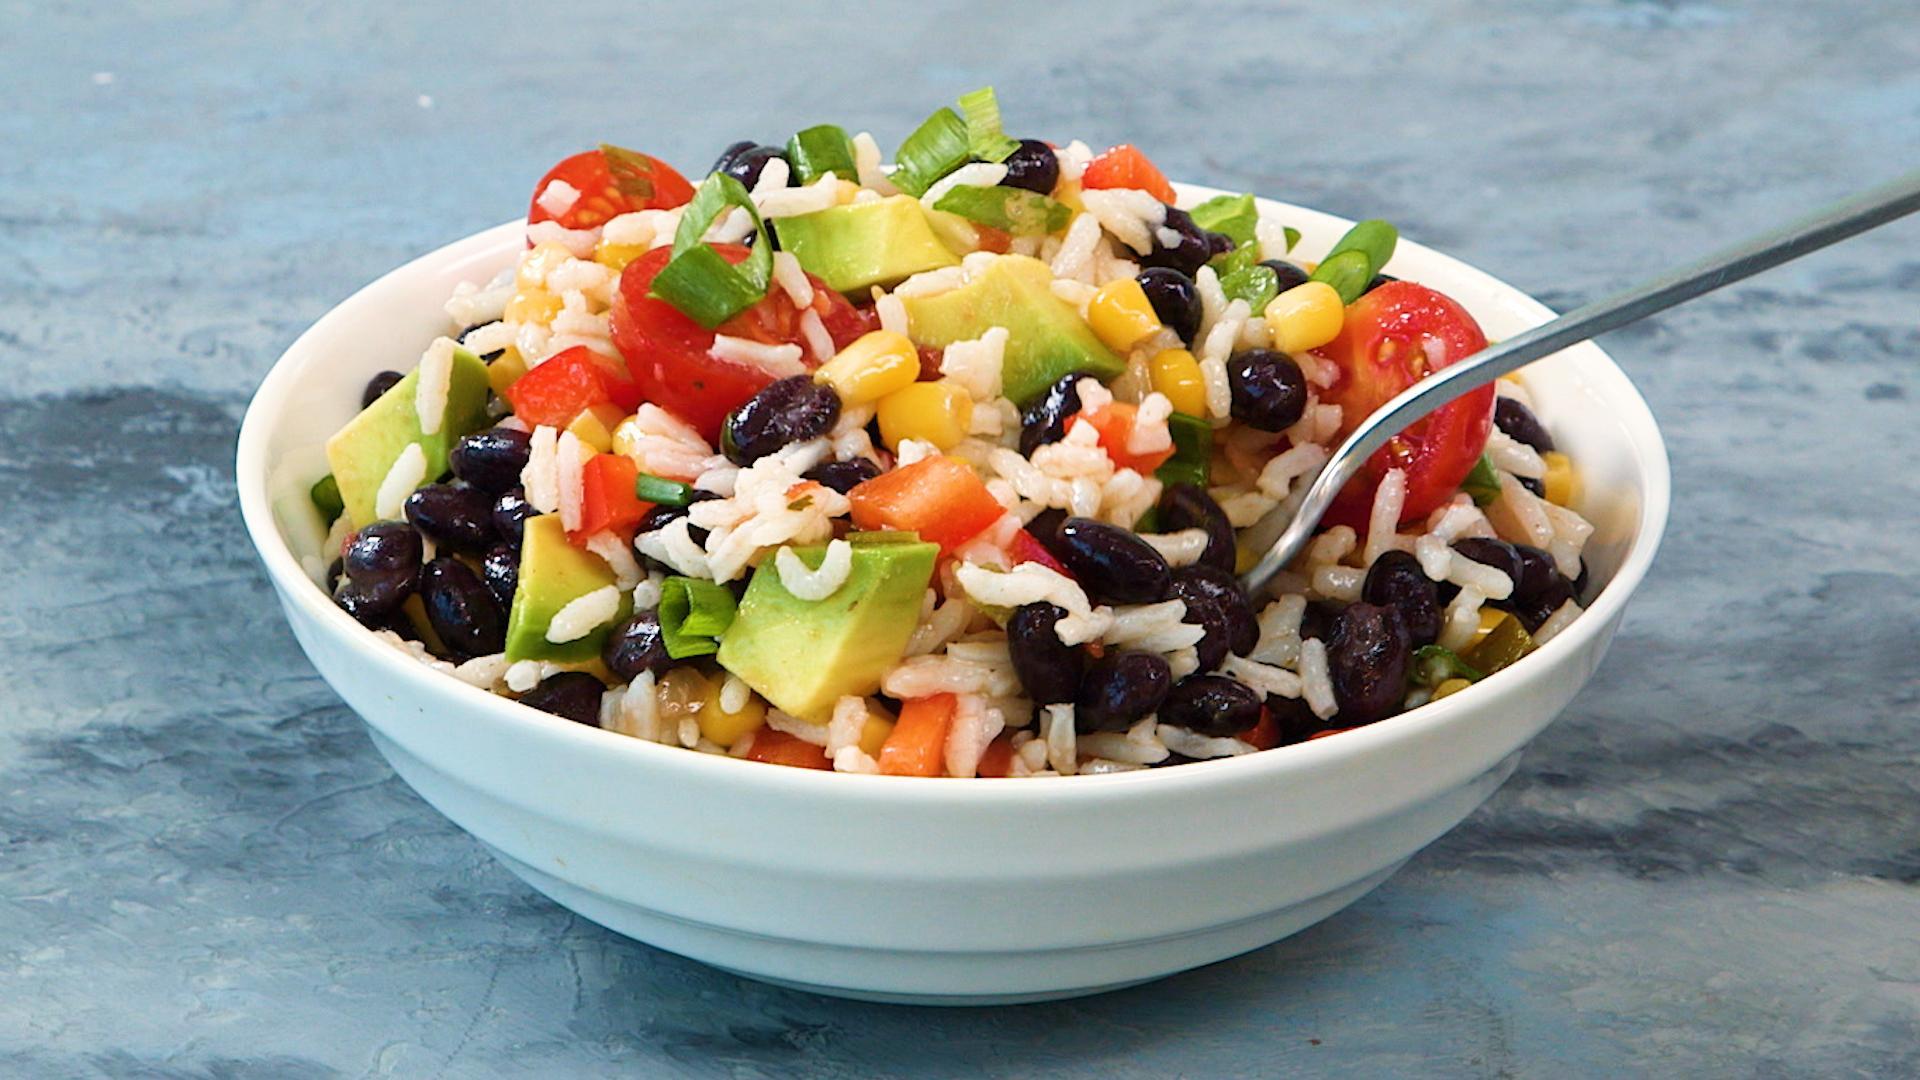 fiesta rice salad recipe myrecipes rh myrecipes com